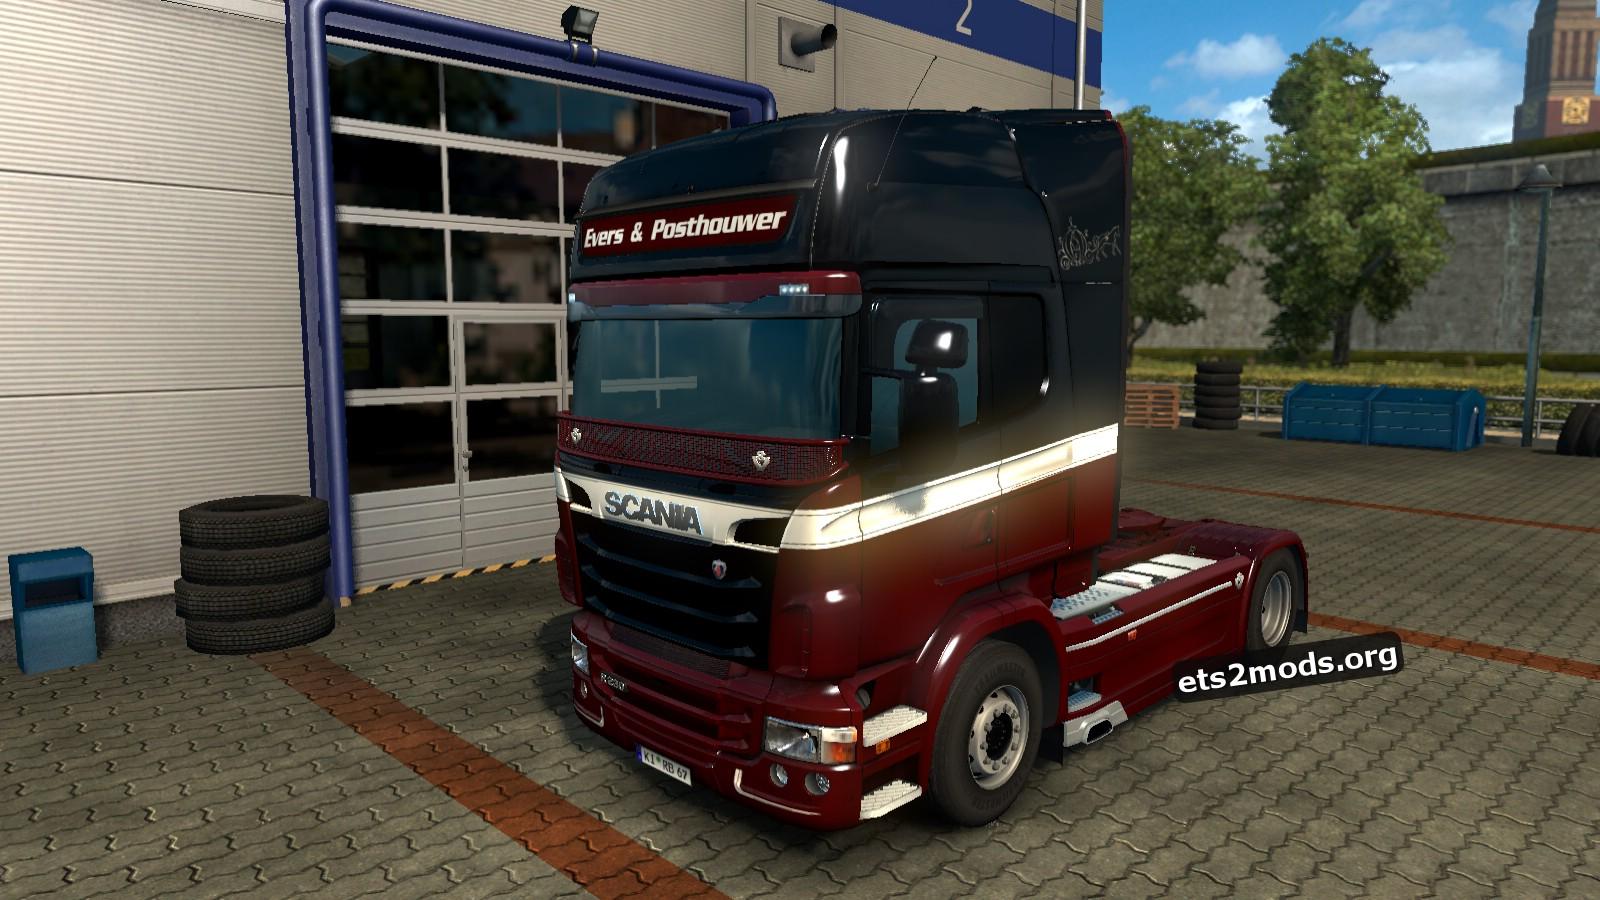 Scania RJL Evers & Posthouwer Skin